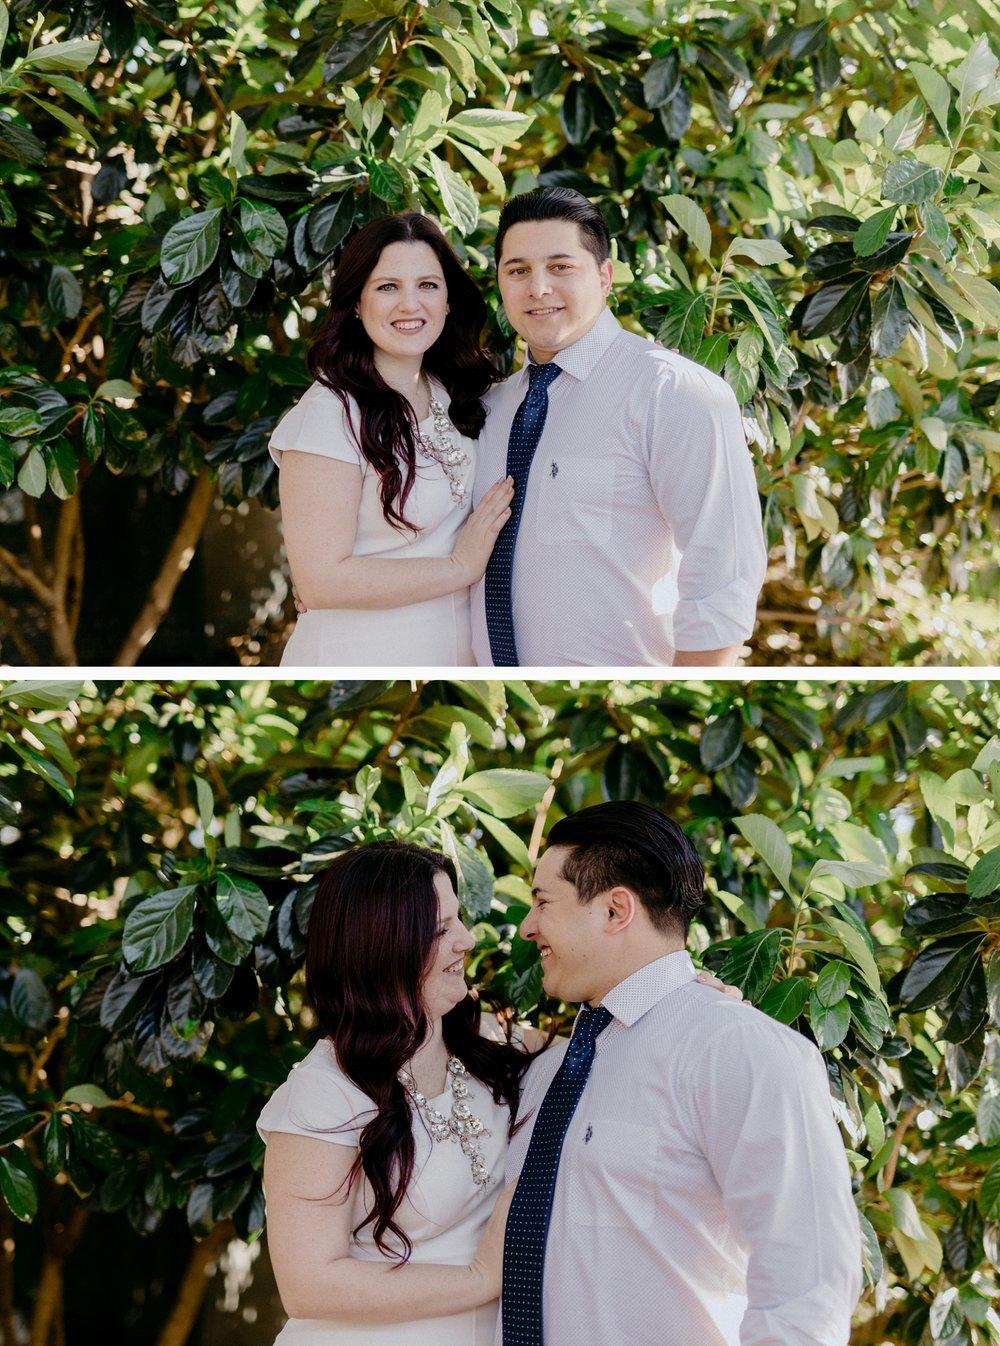 Bibi-And-Josh-Lake-Eola-Engagement_0014.jpg